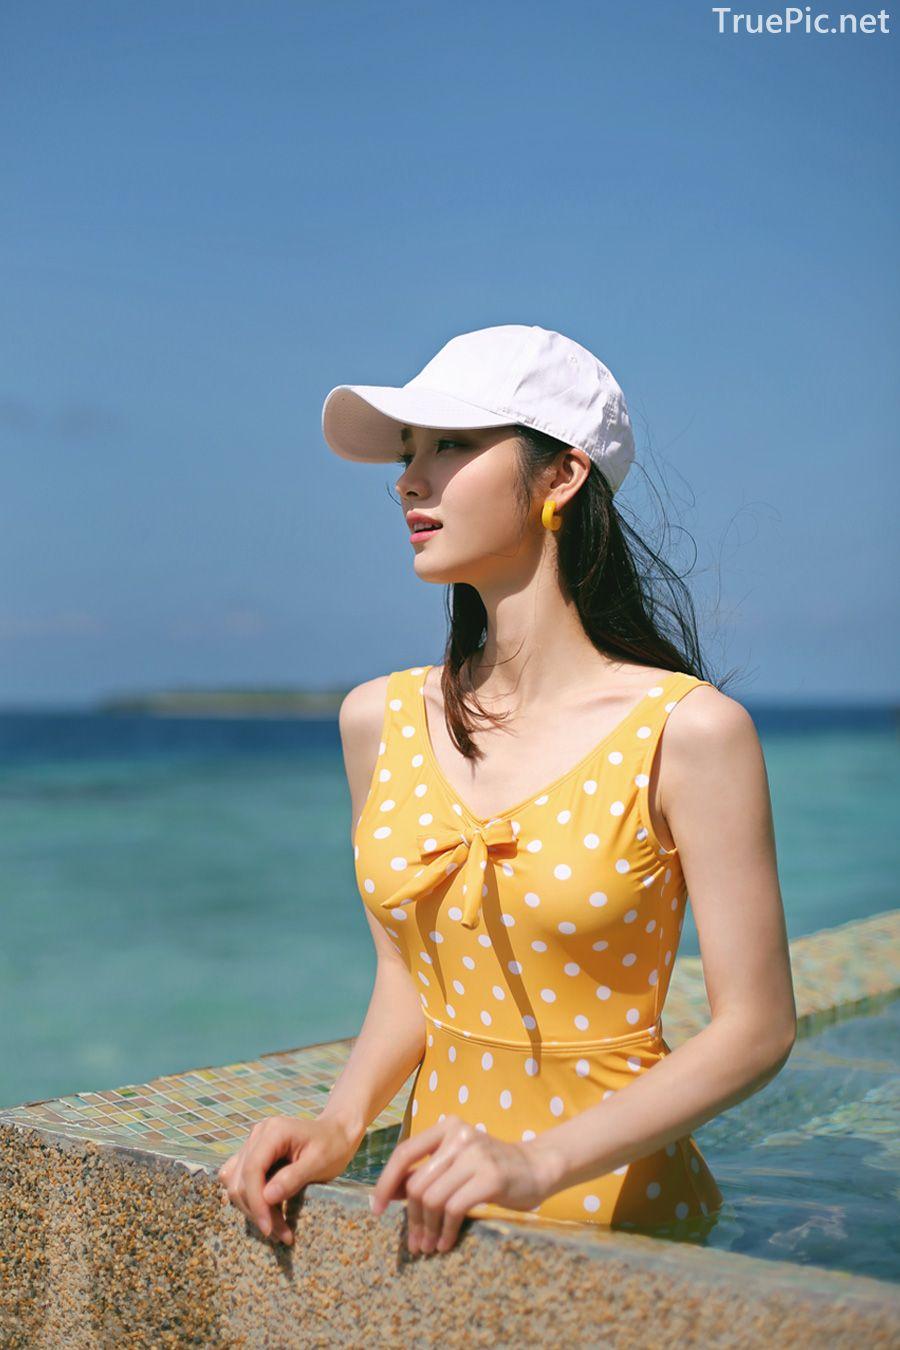 Korean fashion model Jeong Hee - Everyone once a monokini - Picture 3